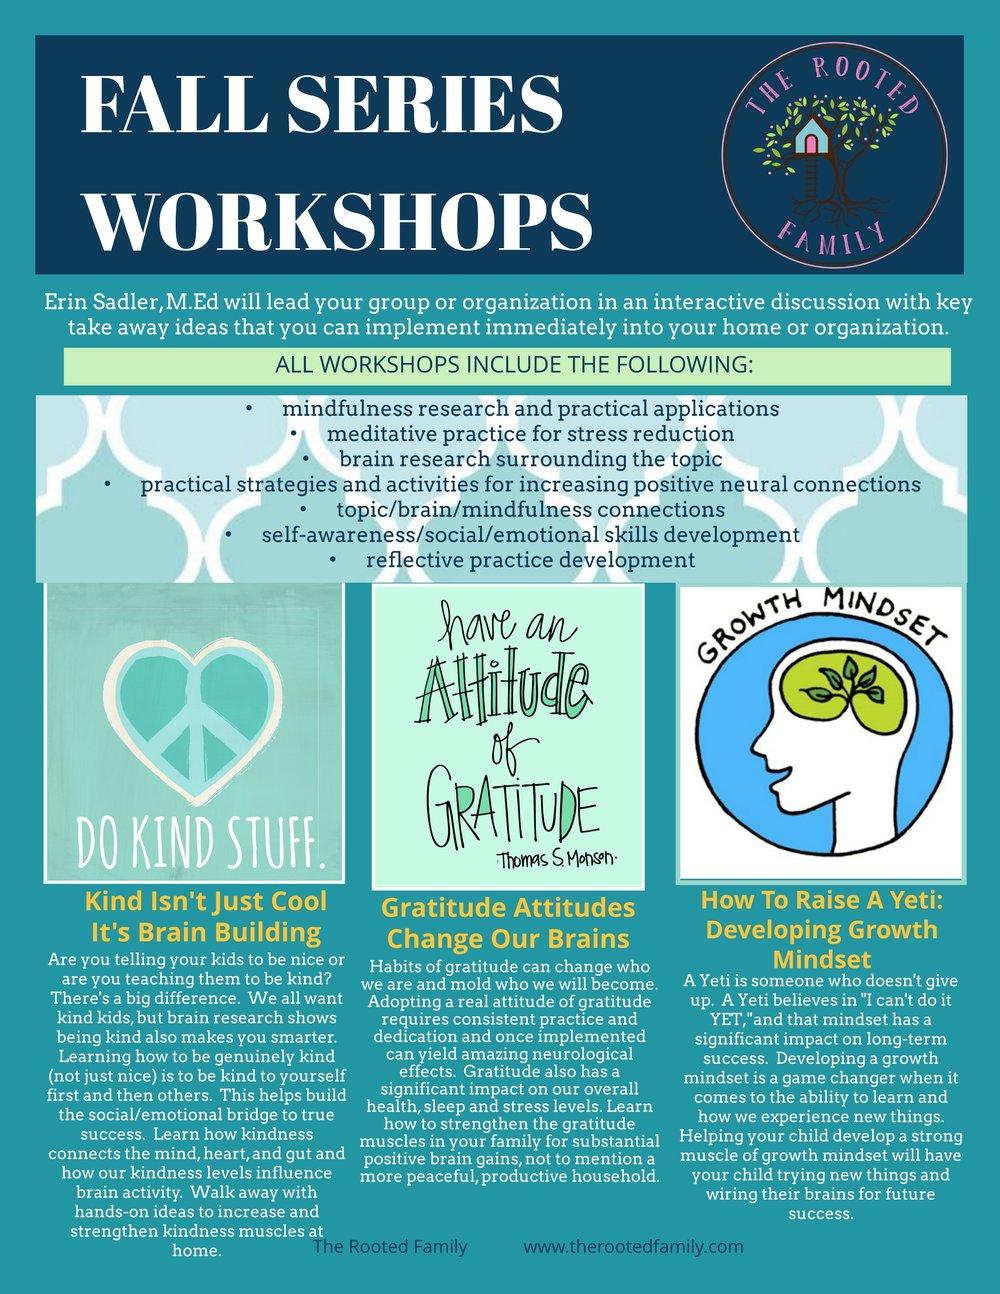 workshops for fall speaking.jpeg